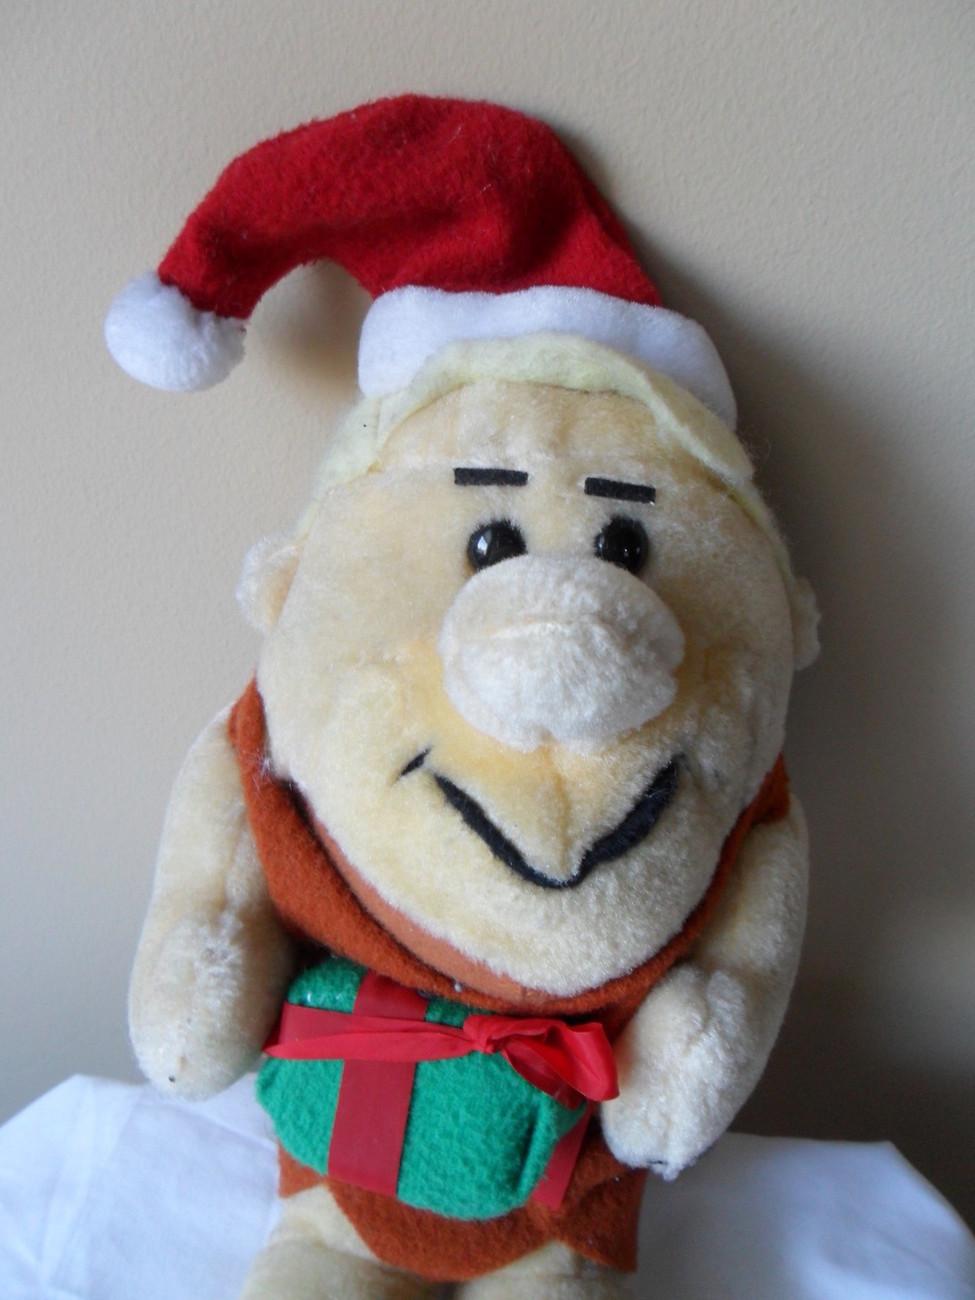 "Flinstones Barney Rubble 10"" Nanco 1989 Plush Stuffed Christmas Gift Toy"